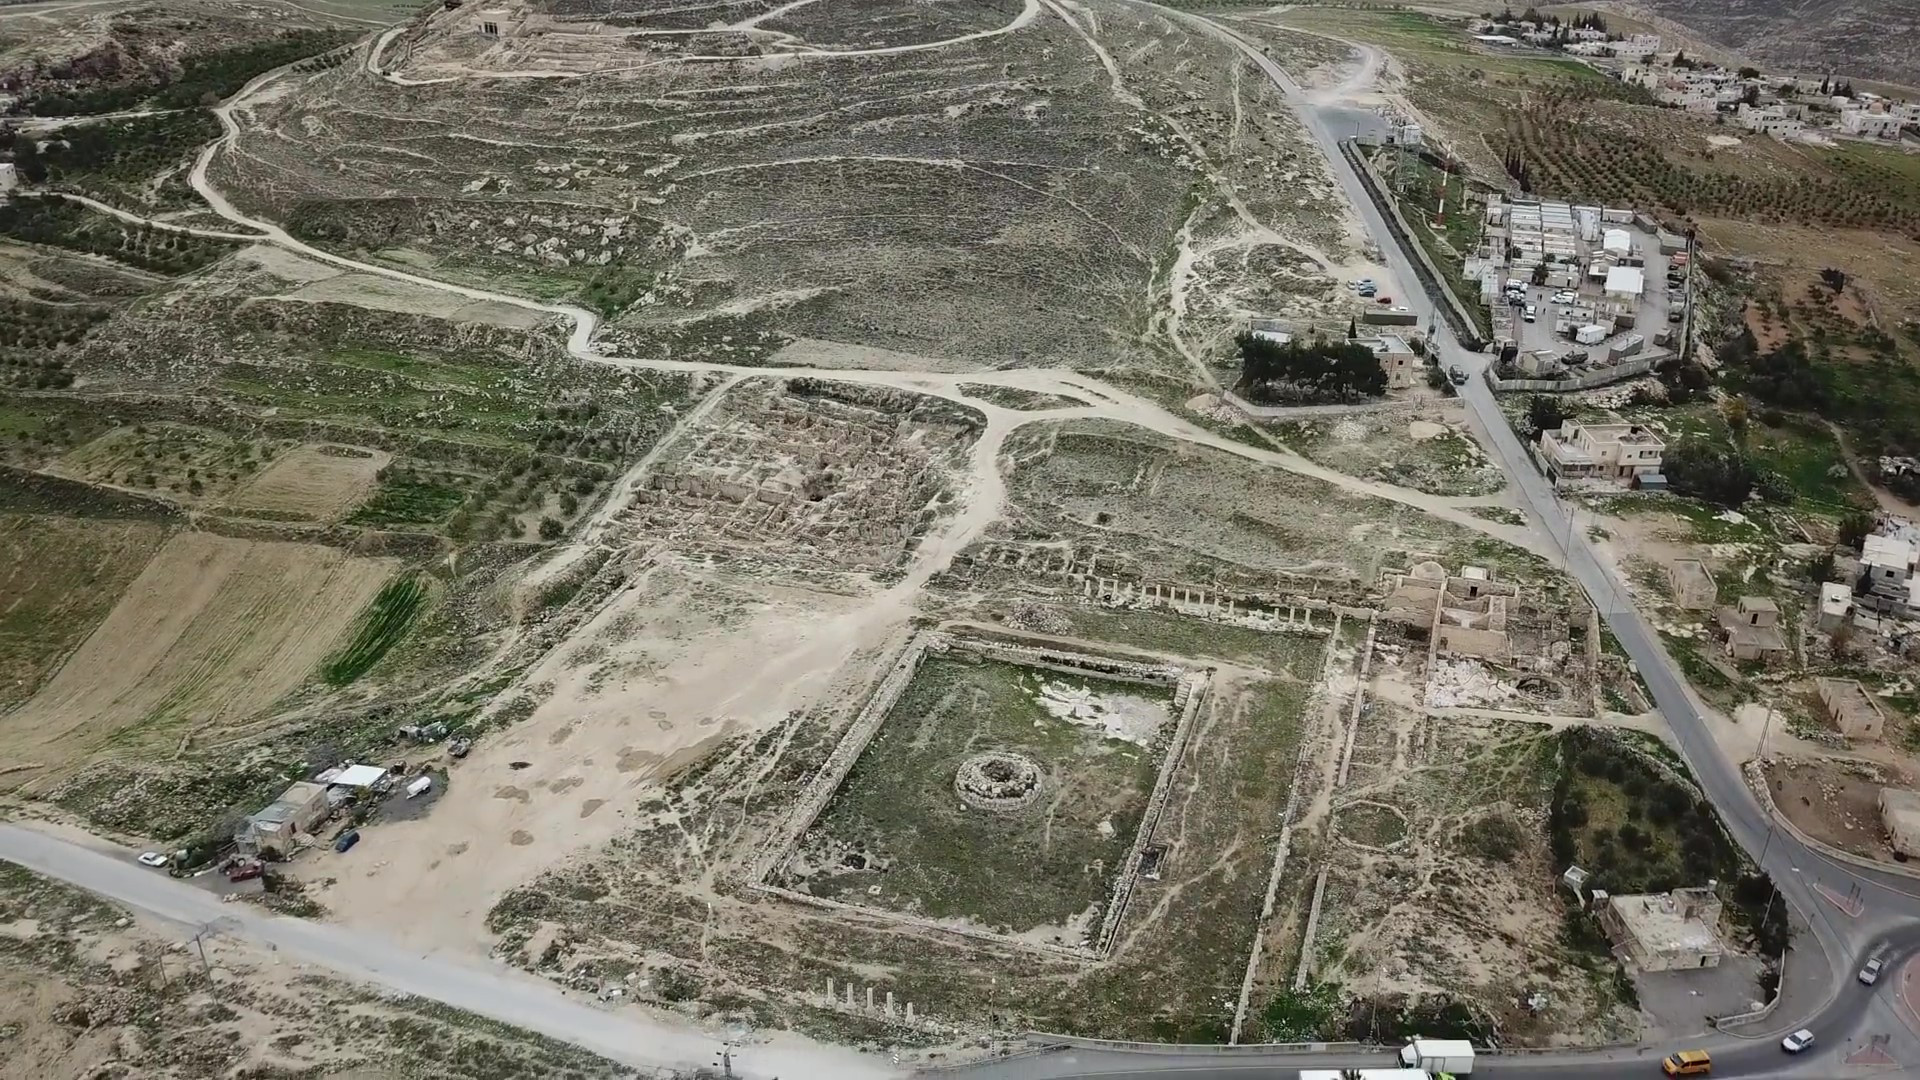 Herodion Aerial Views 1_Moment6.jpg